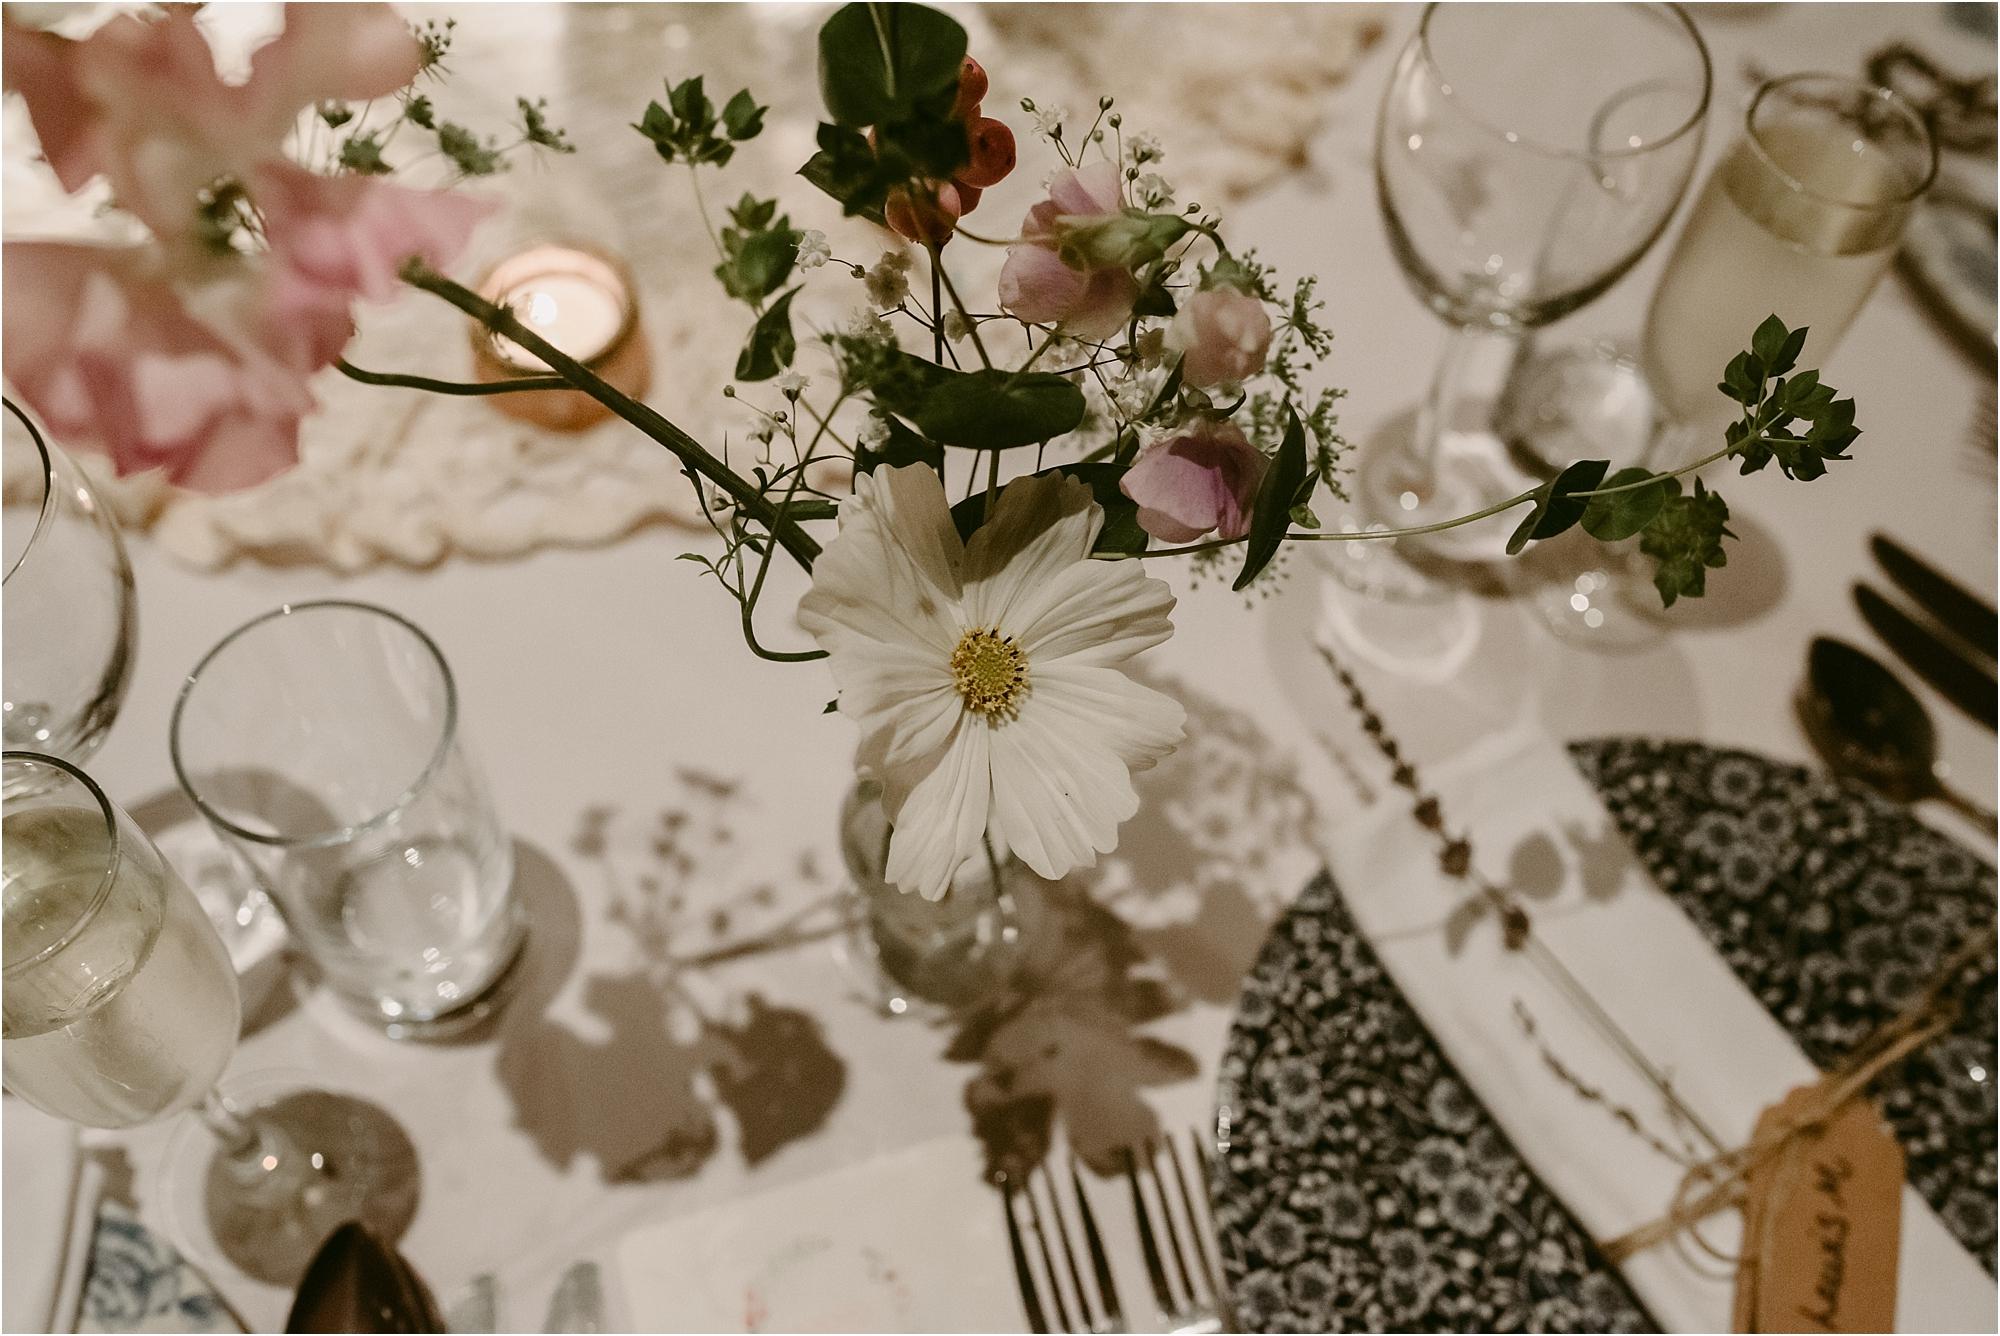 Scott+Joanna-Kinkell-Byre-wedding-fife-photography__0076.jpg